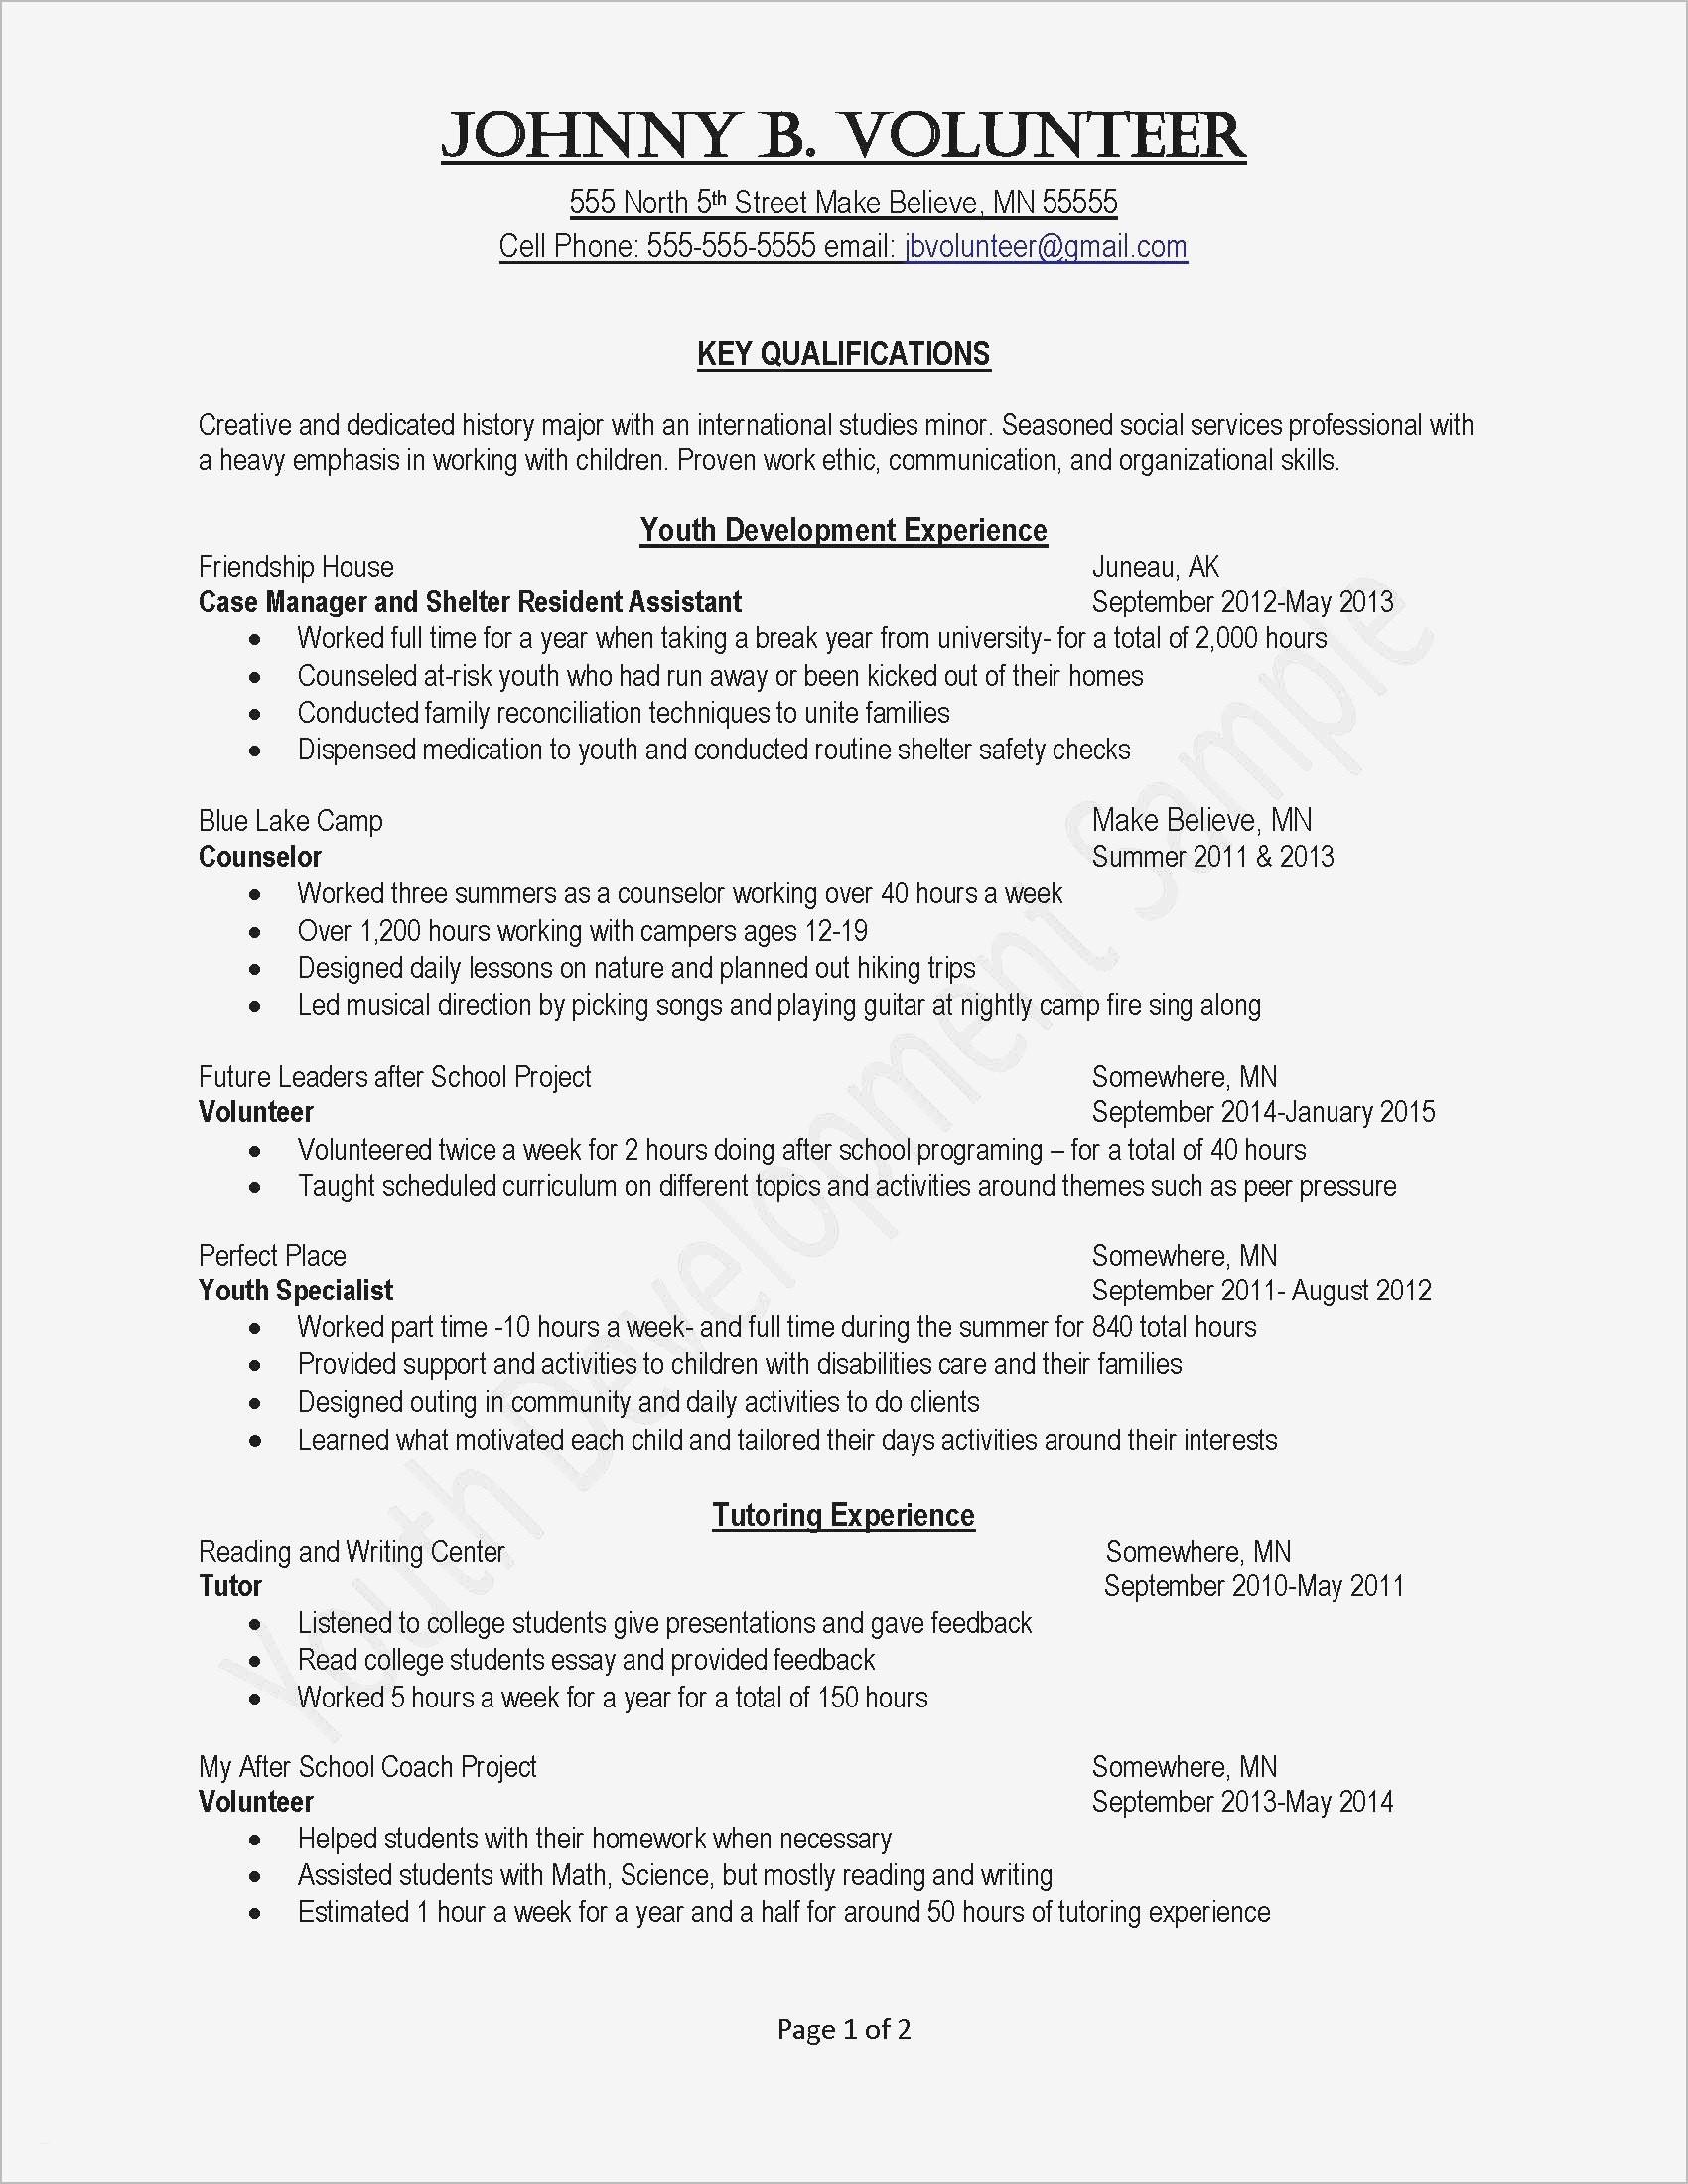 Job Letter Offer Template - Job Fer Letter Template Us Copy Od Consultant Cover Letter Fungram